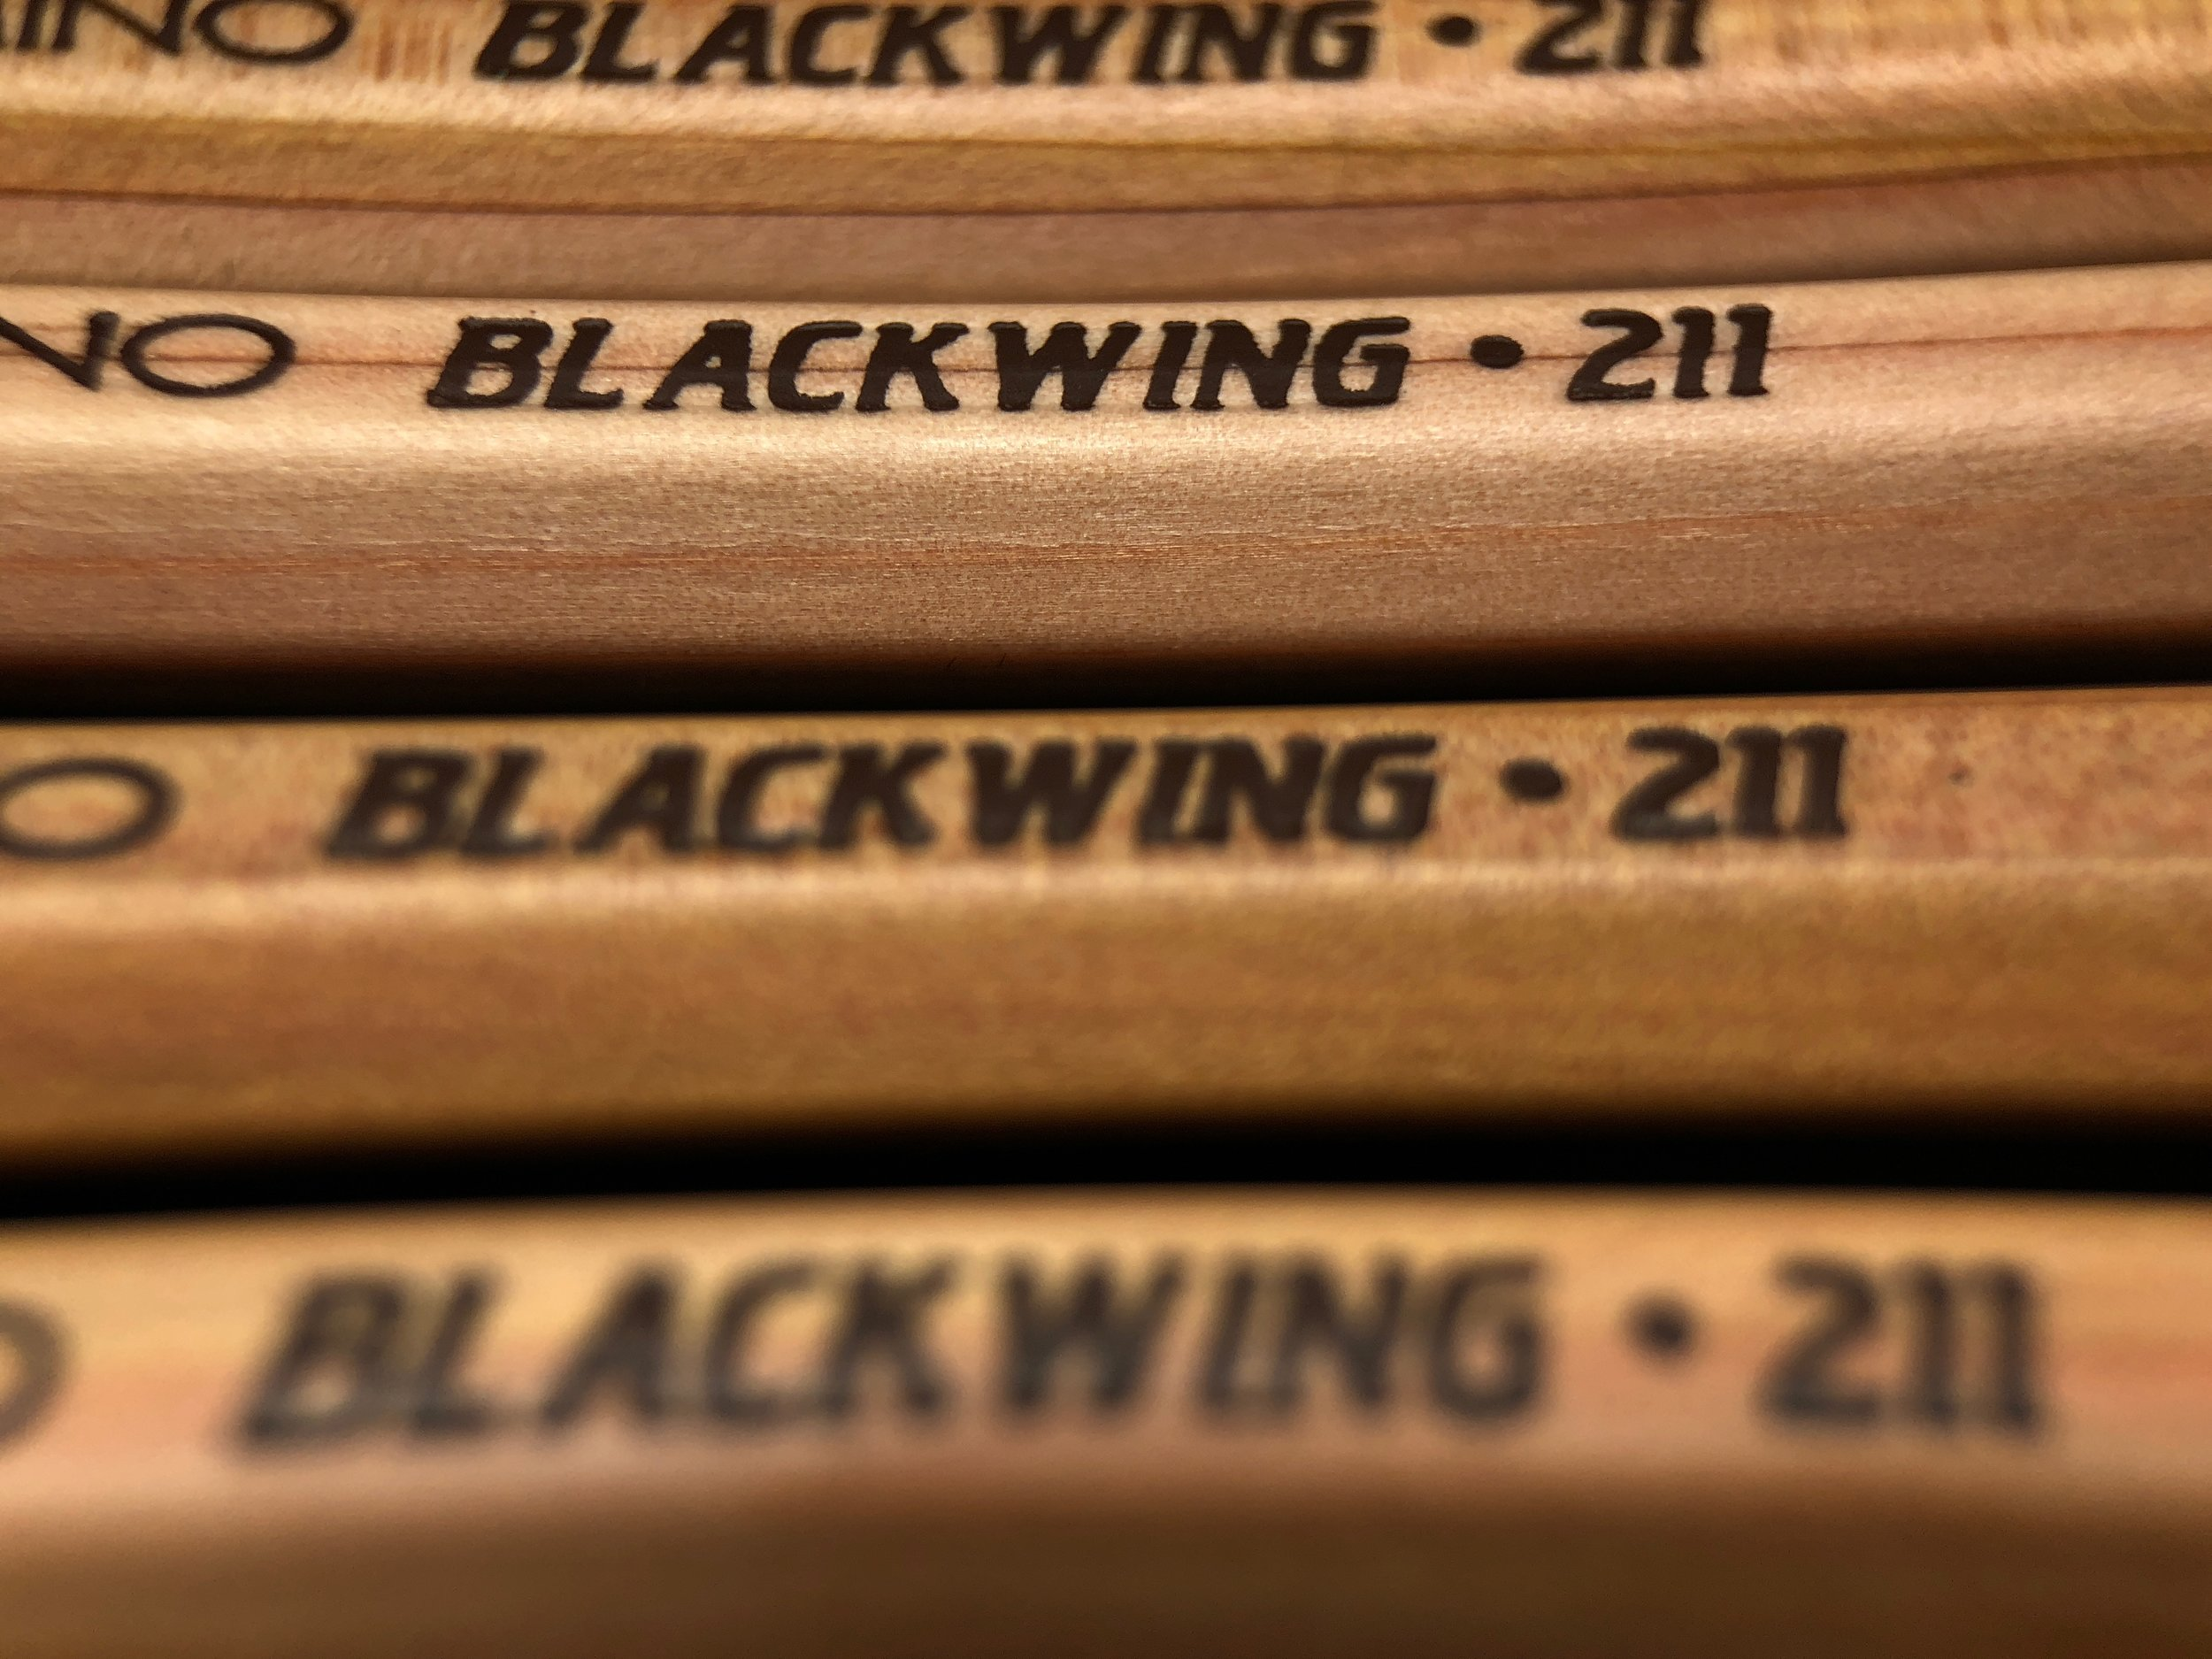 palomino-blackwing-211-pencil-10.jpg